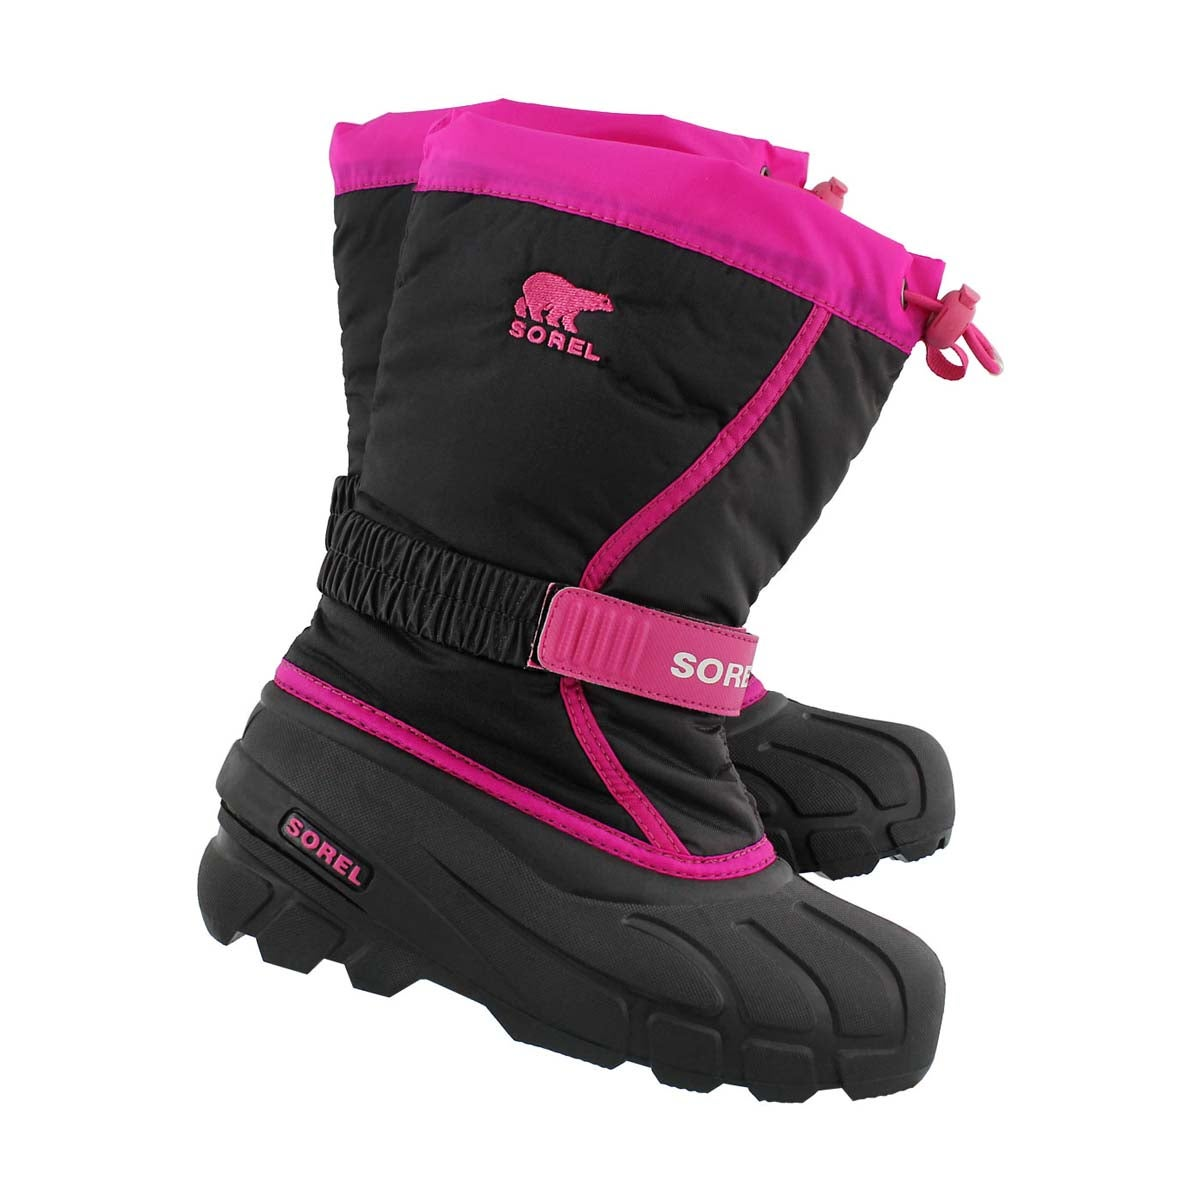 Grls Flurry pnk/blk pullon winter boot